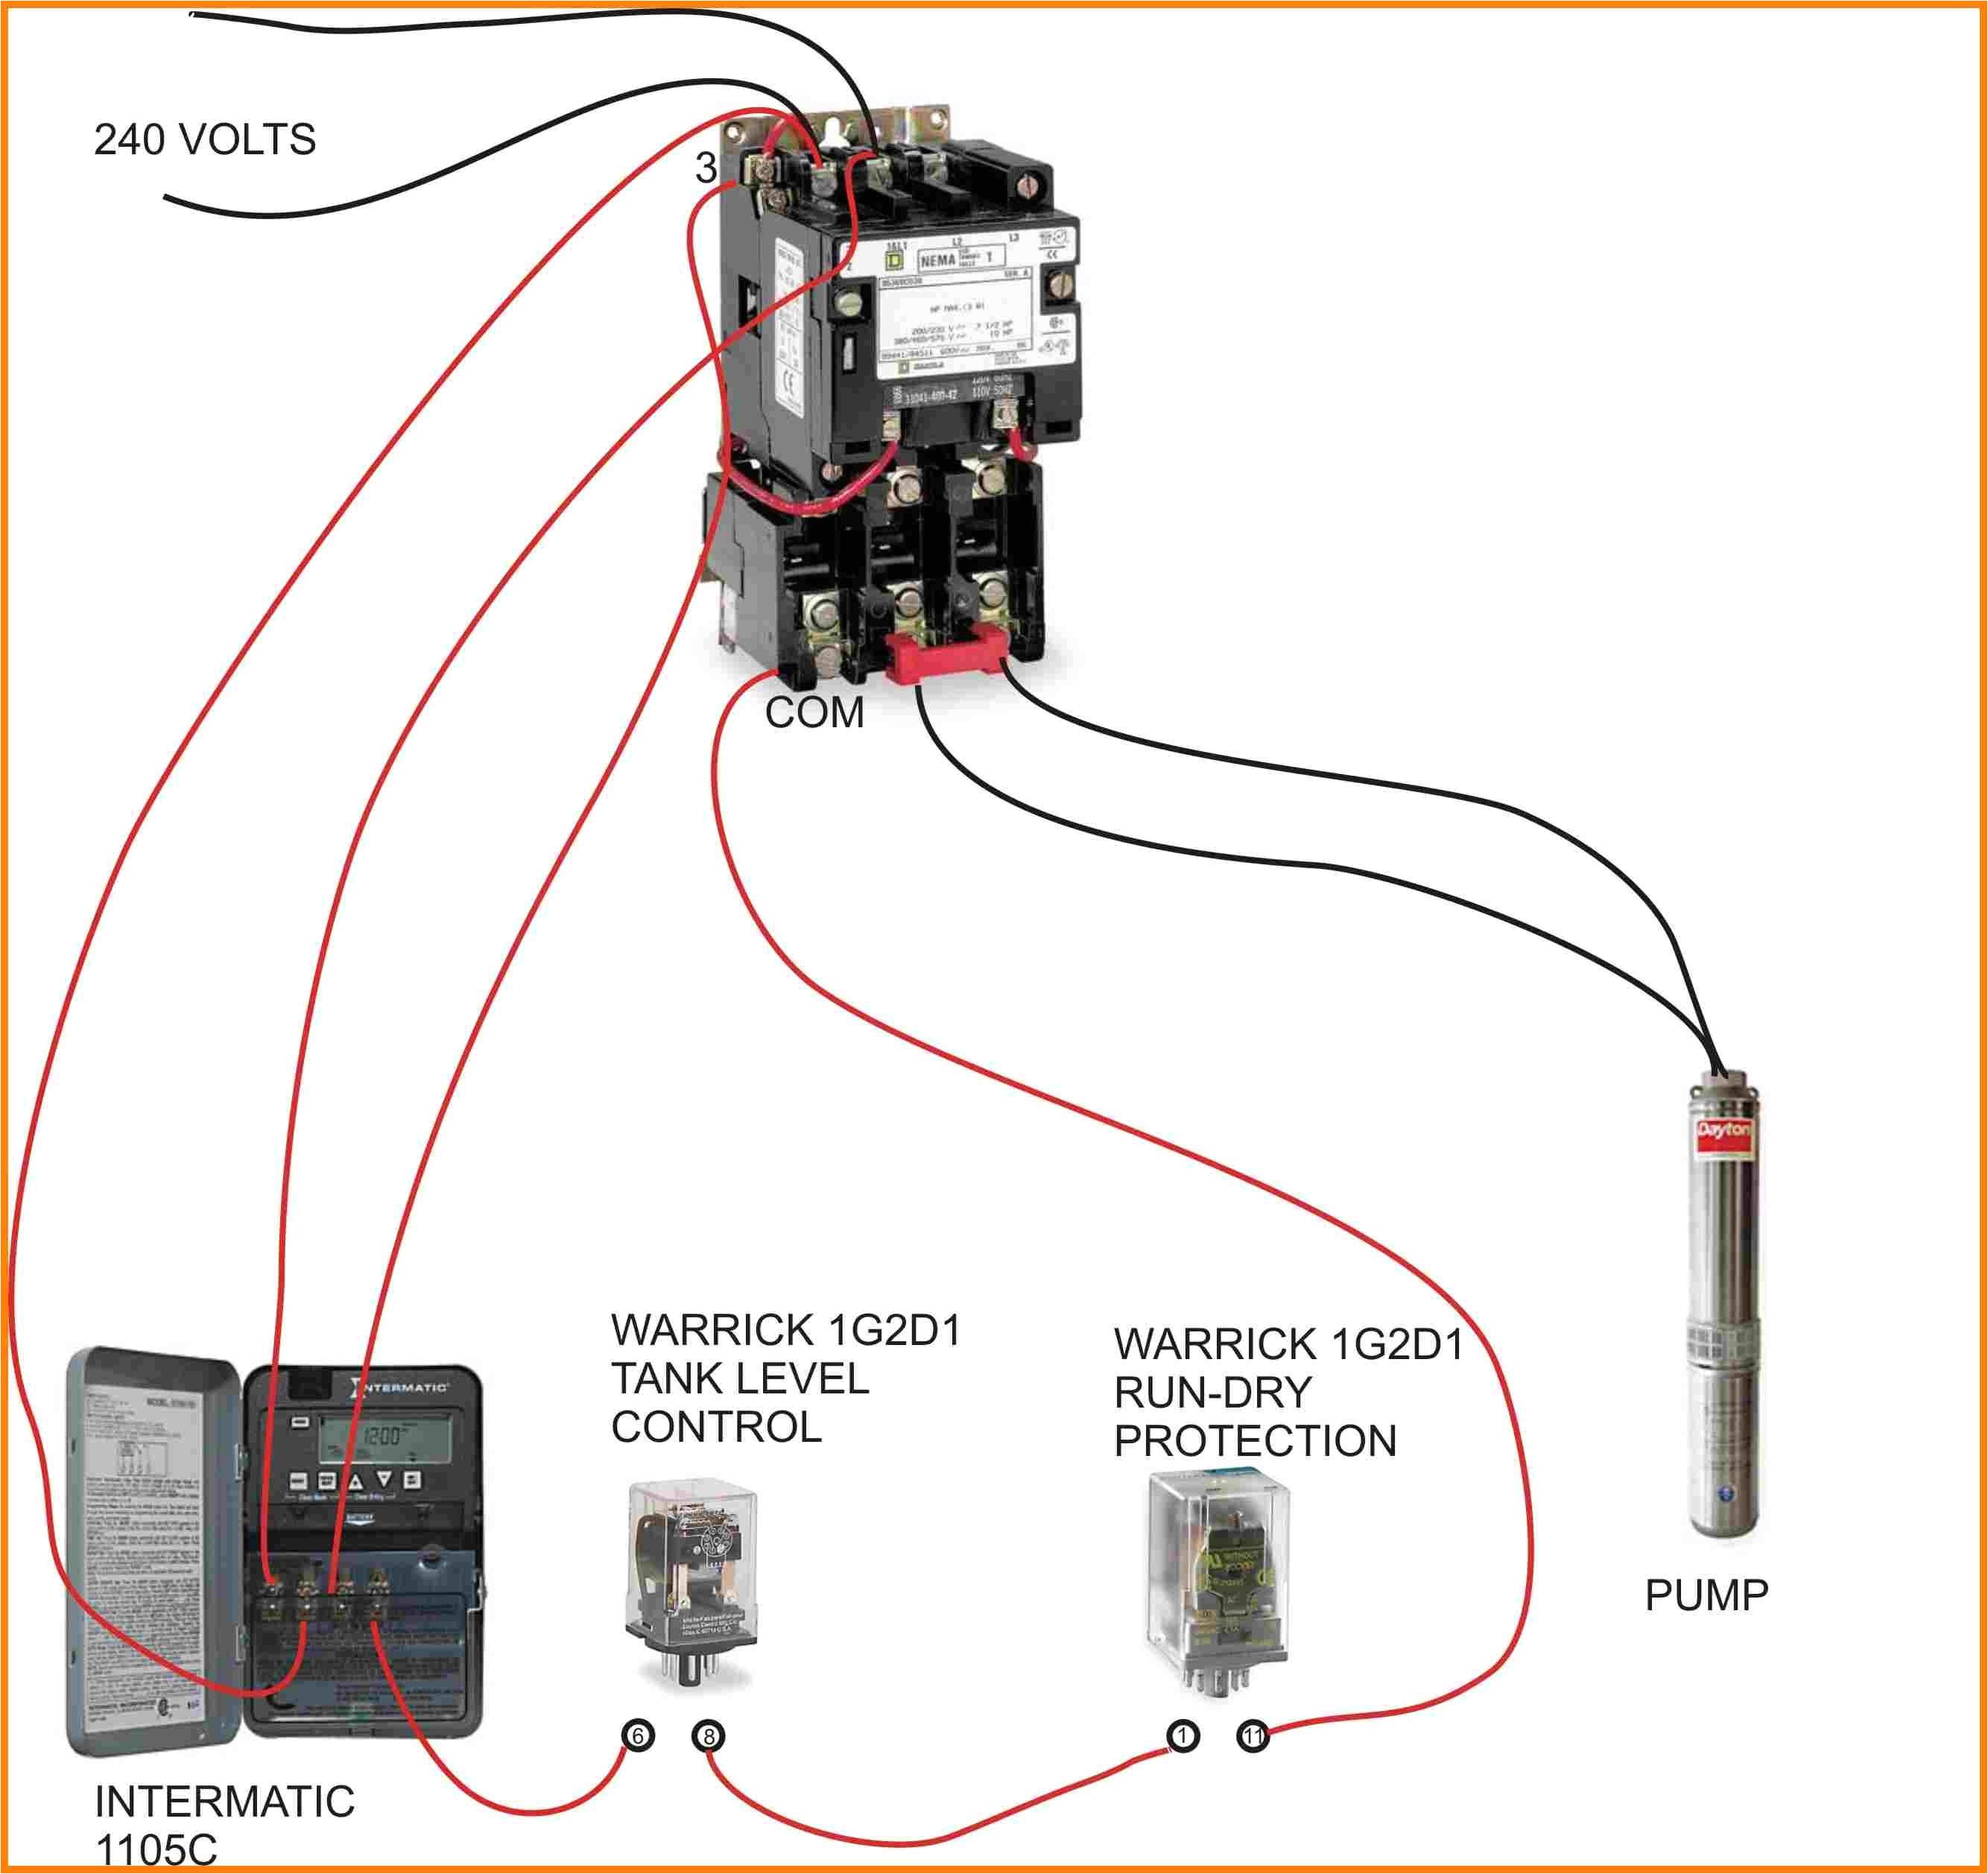 4p contactor wiring diagram wiring diagrams favorites 4p contactor 30a wiring diagram wiring diagrams second 4p